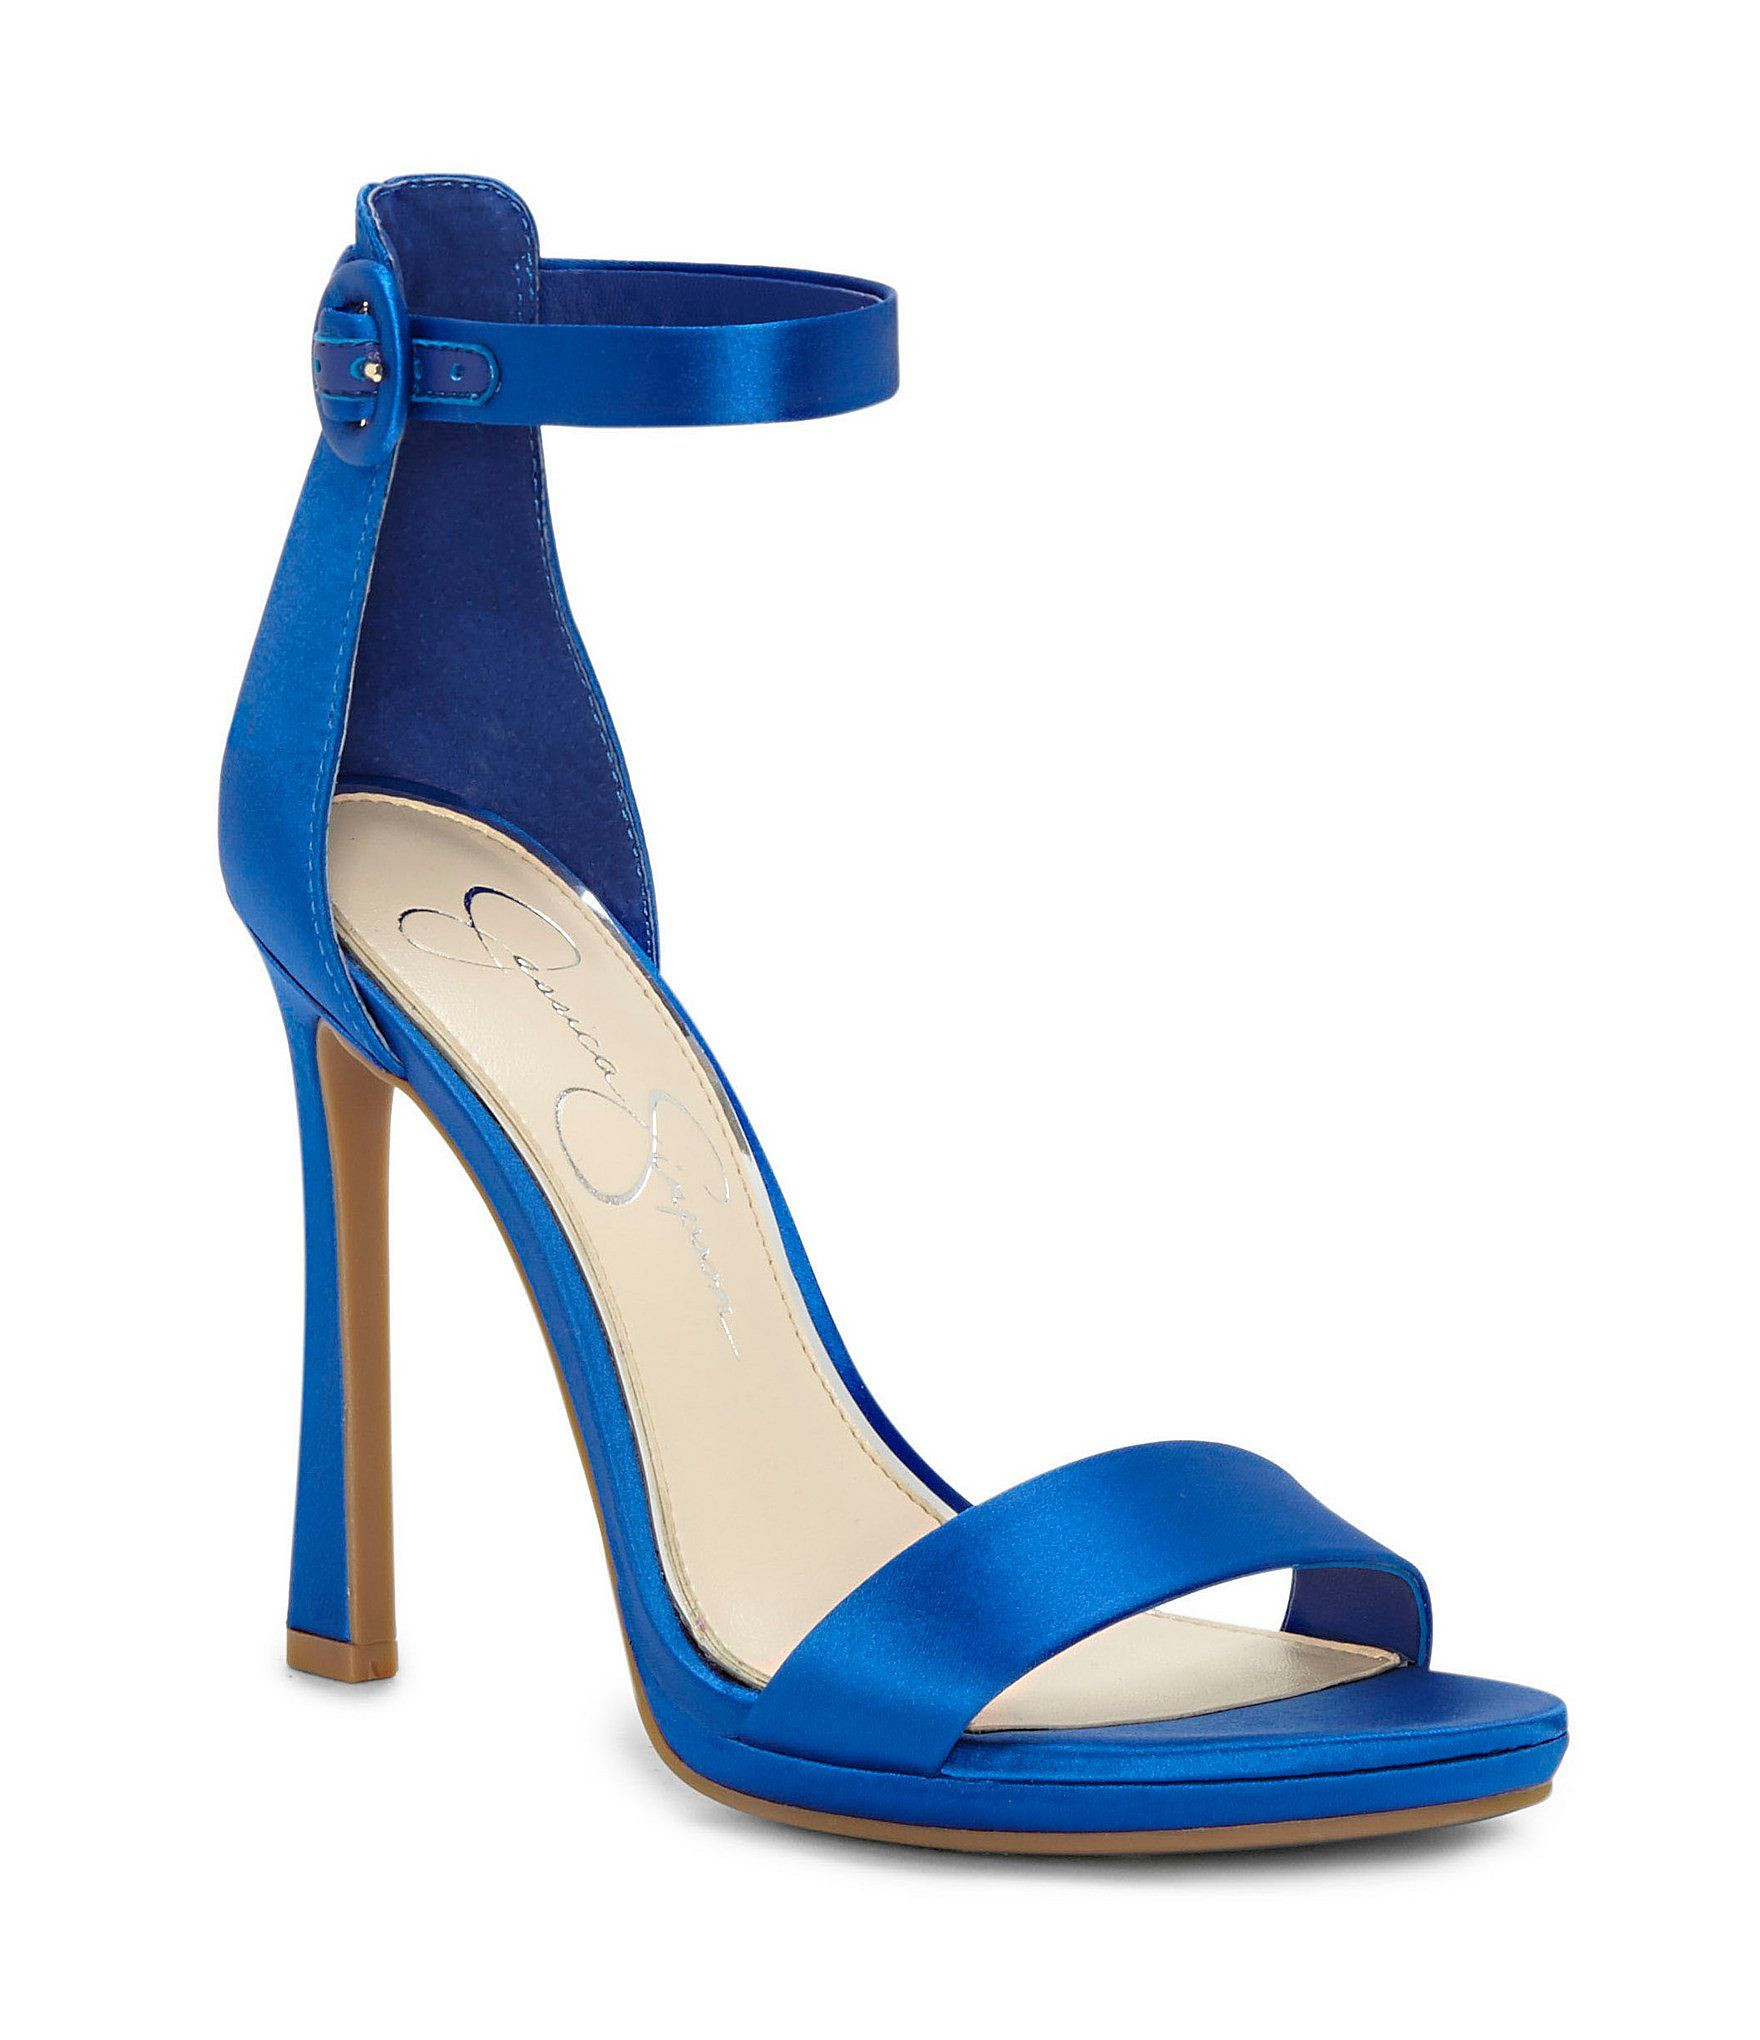 Jessica Simpson Plemy Ankle Strap Sandal (Women's) JcF15